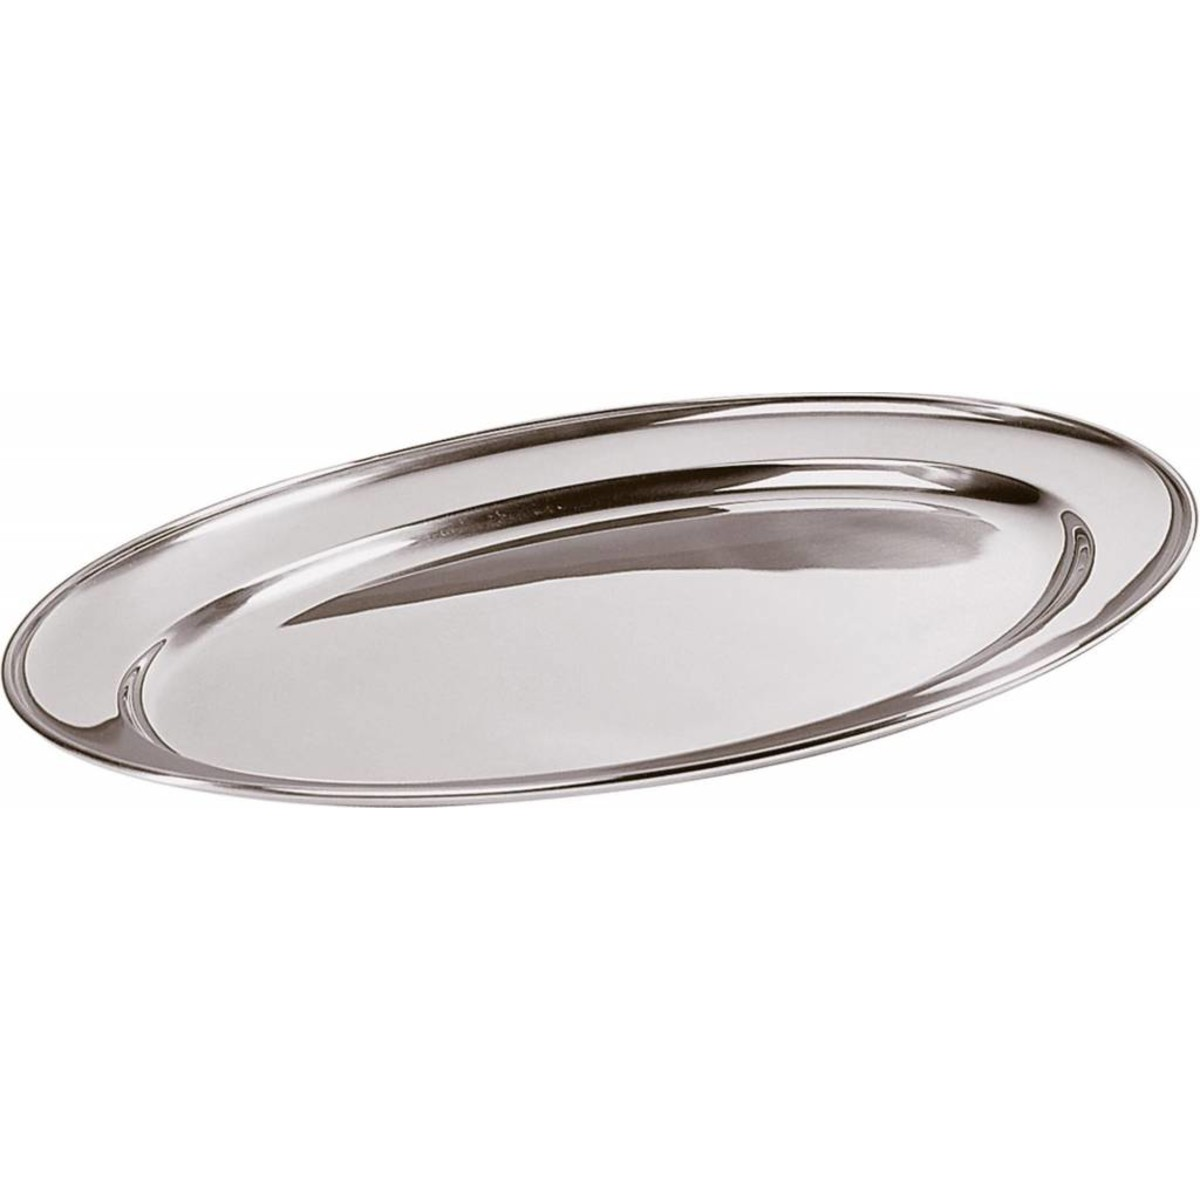 Bratenplatte/Servierplatte oval 40x26cm